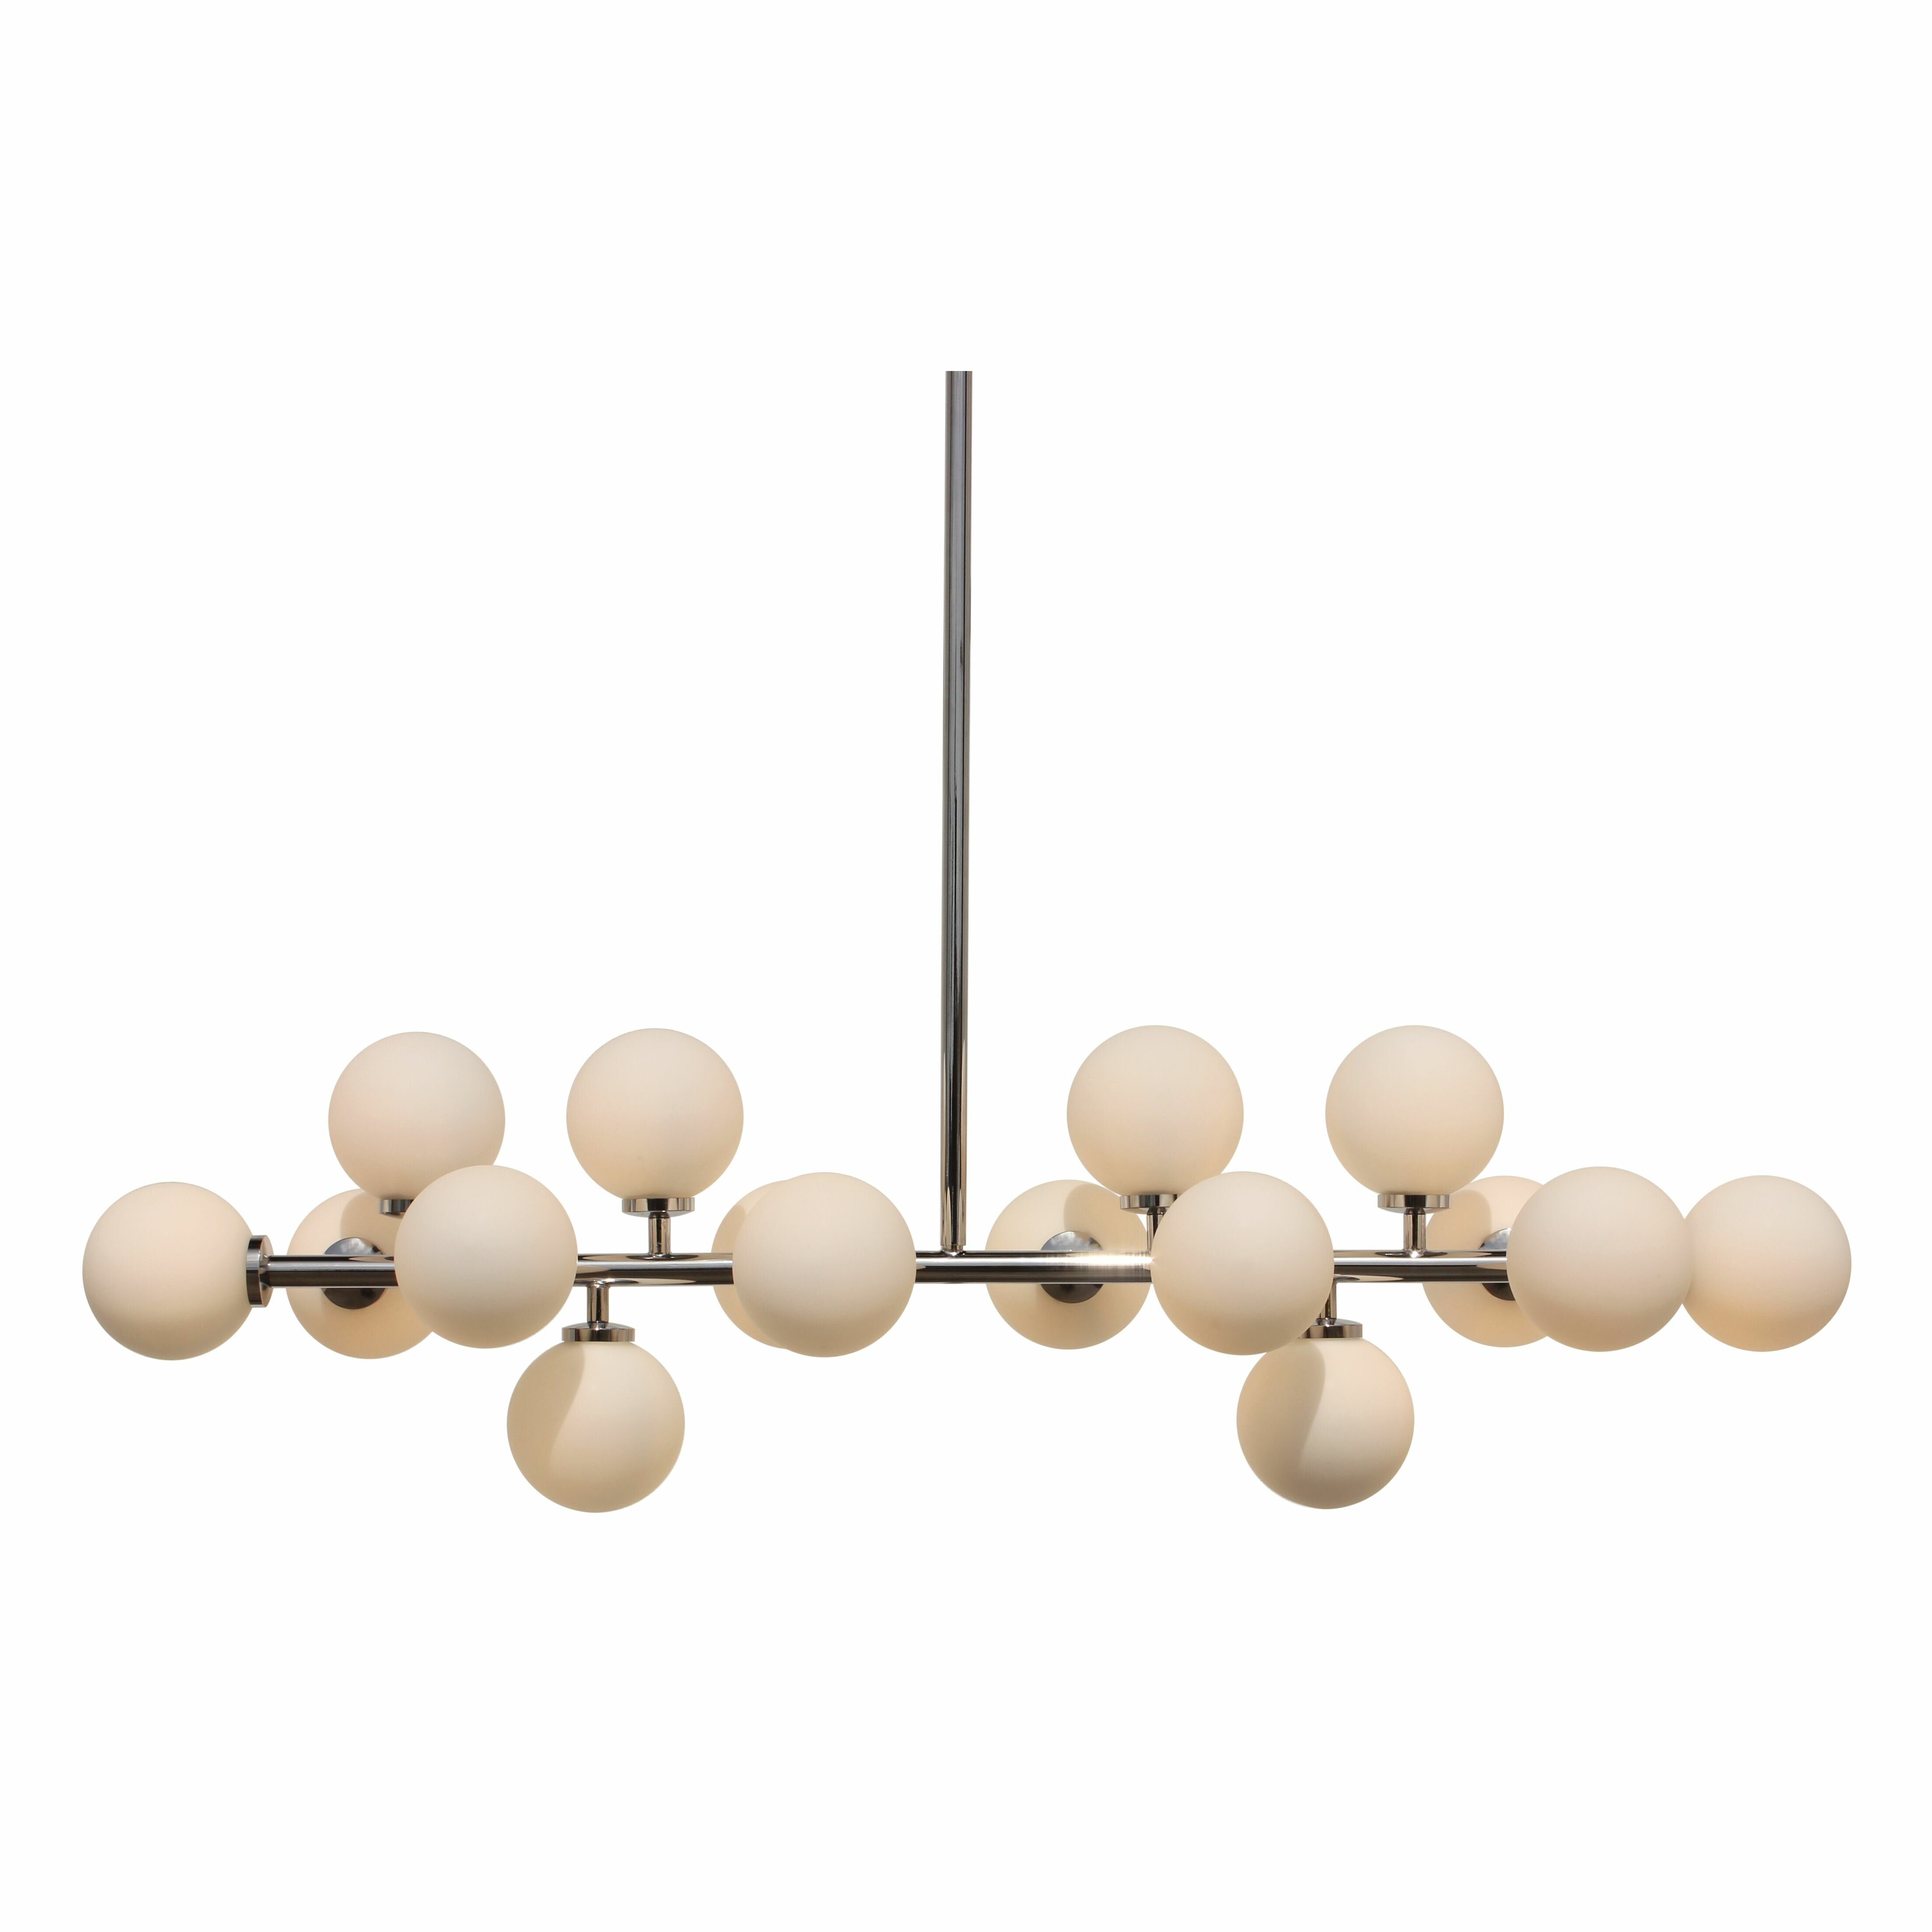 George Oliver Bridwell 16 Light Sputnik Modern Linear Chandelier Reviews Wayfair